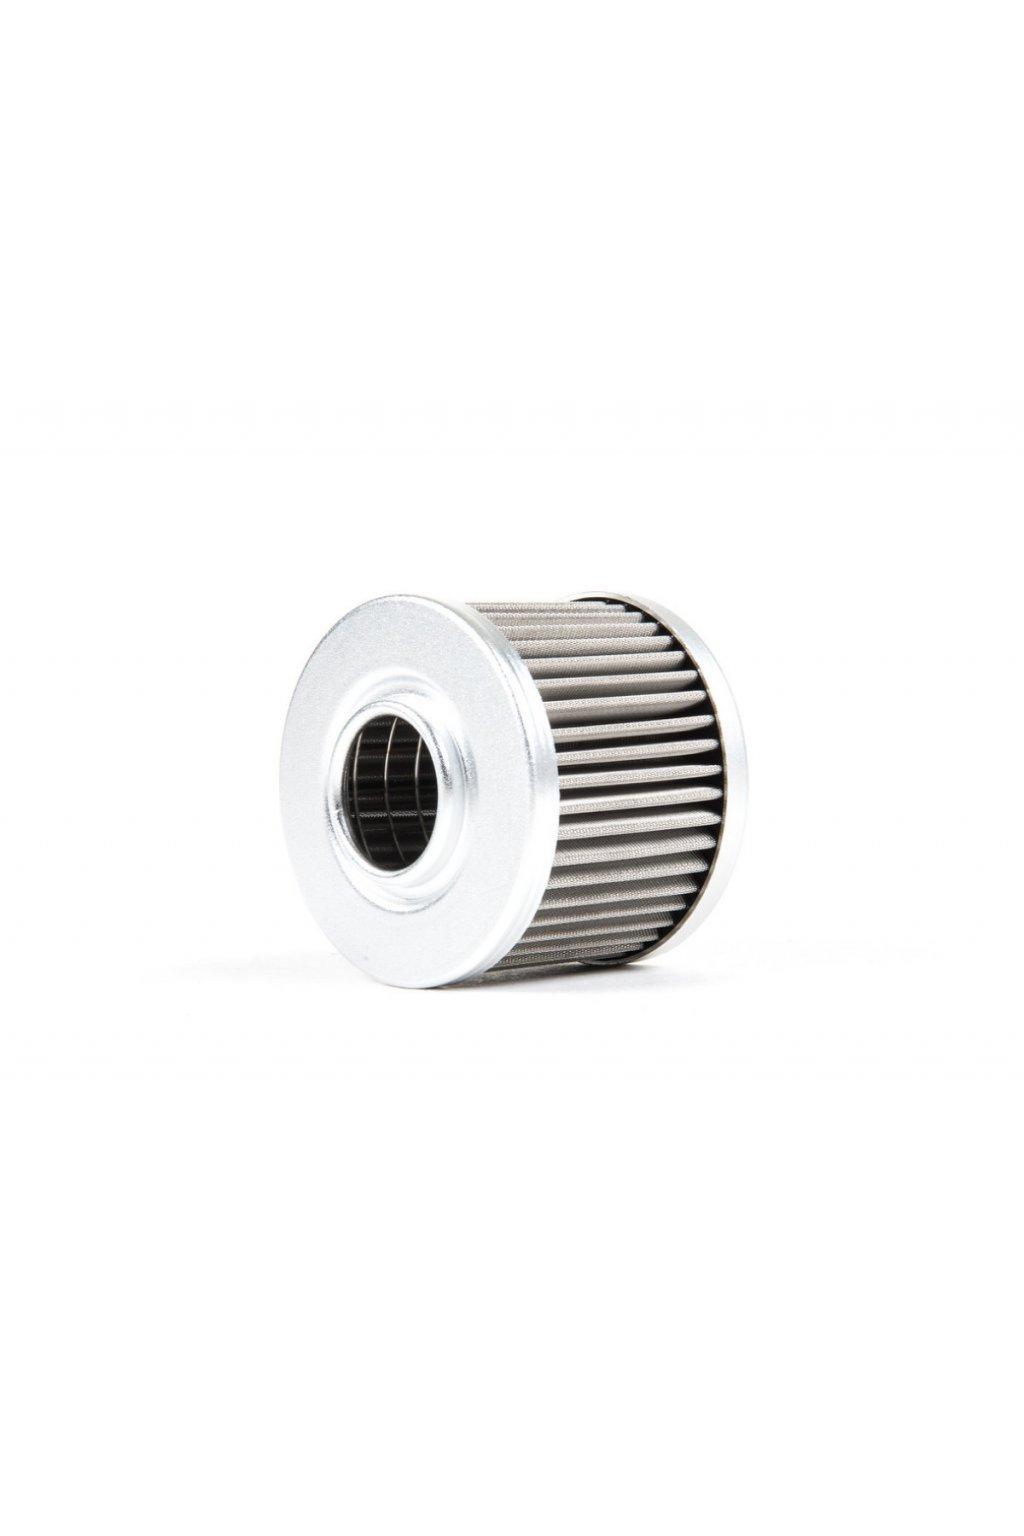 racingline performance nahradni olejovy filtr do sady olejoveho chladice vwr18g700 pro vozy platformy mqb 202032175322